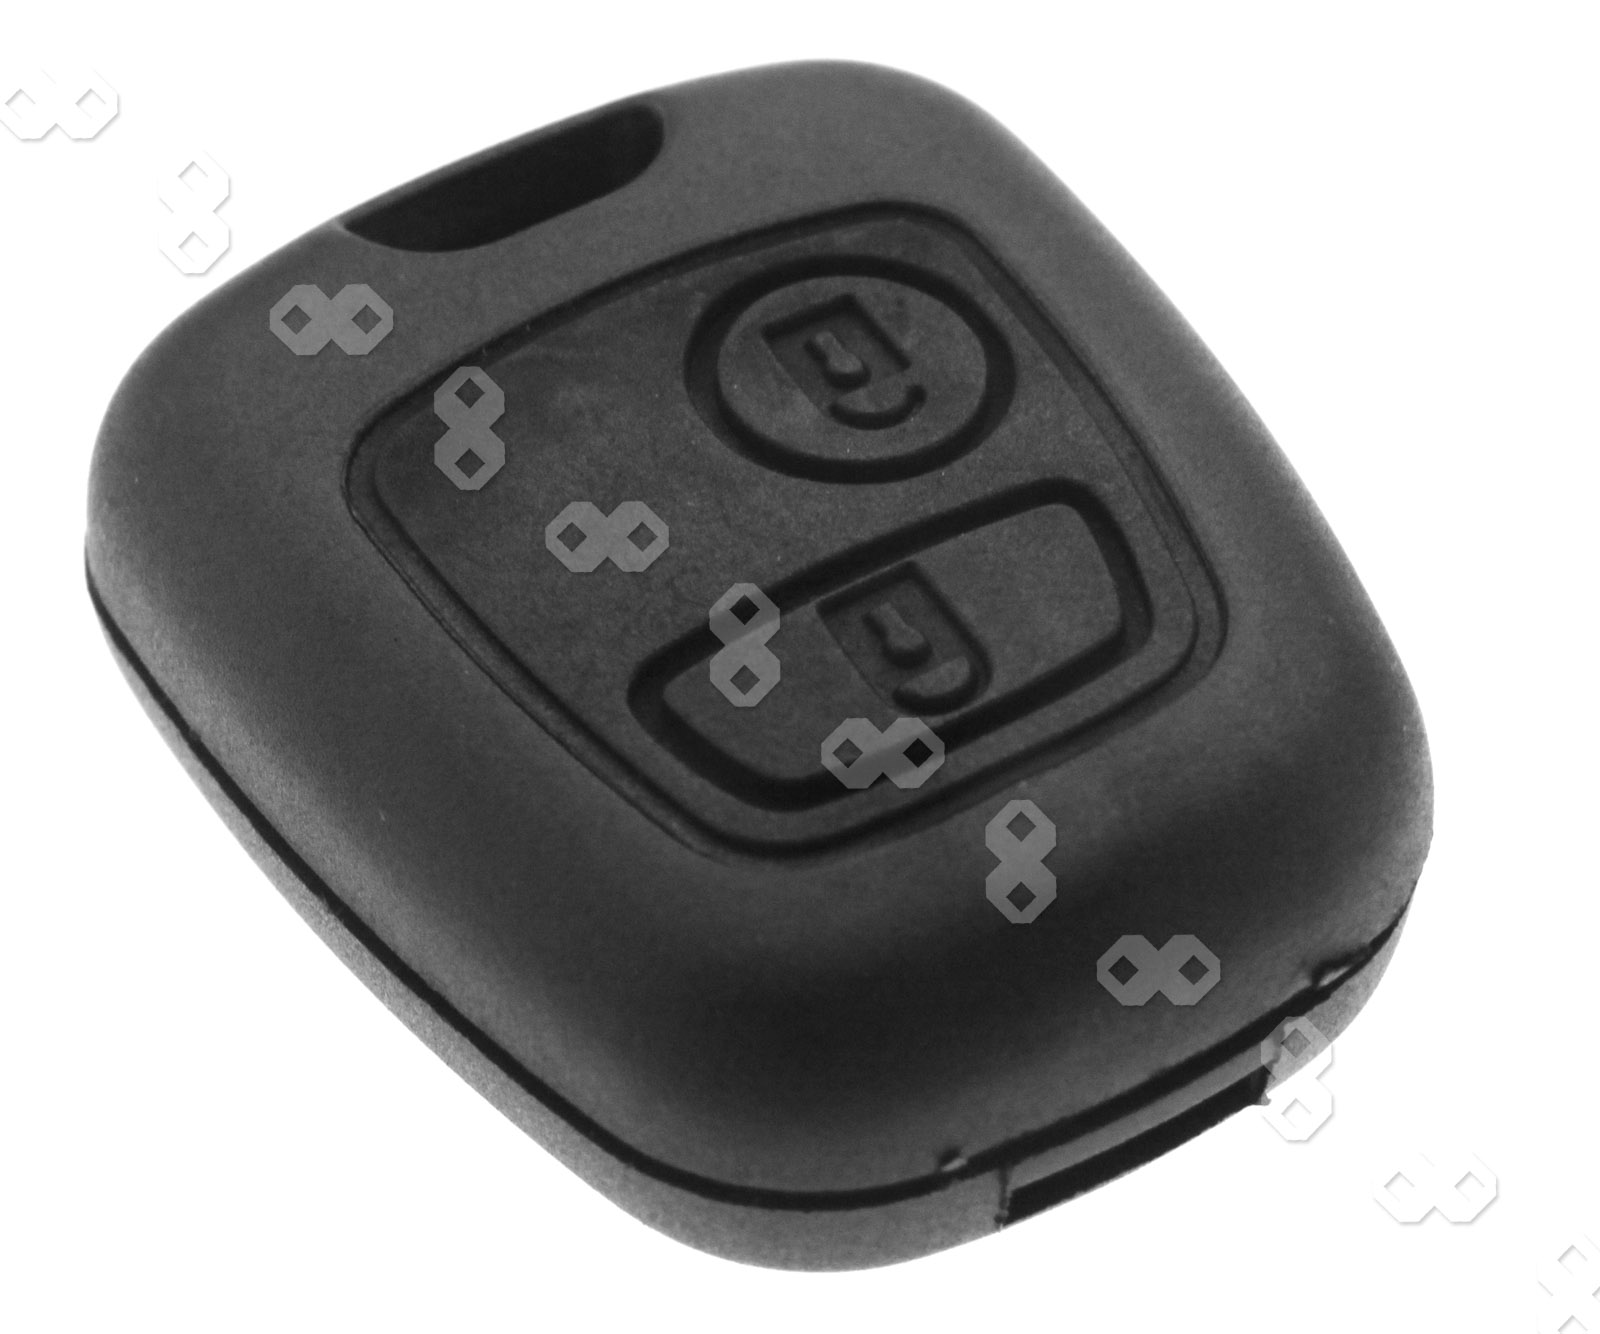 2 button remote key fob case shell cover peugeot 107 207 307 407 106 206 306 406 ebay. Black Bedroom Furniture Sets. Home Design Ideas